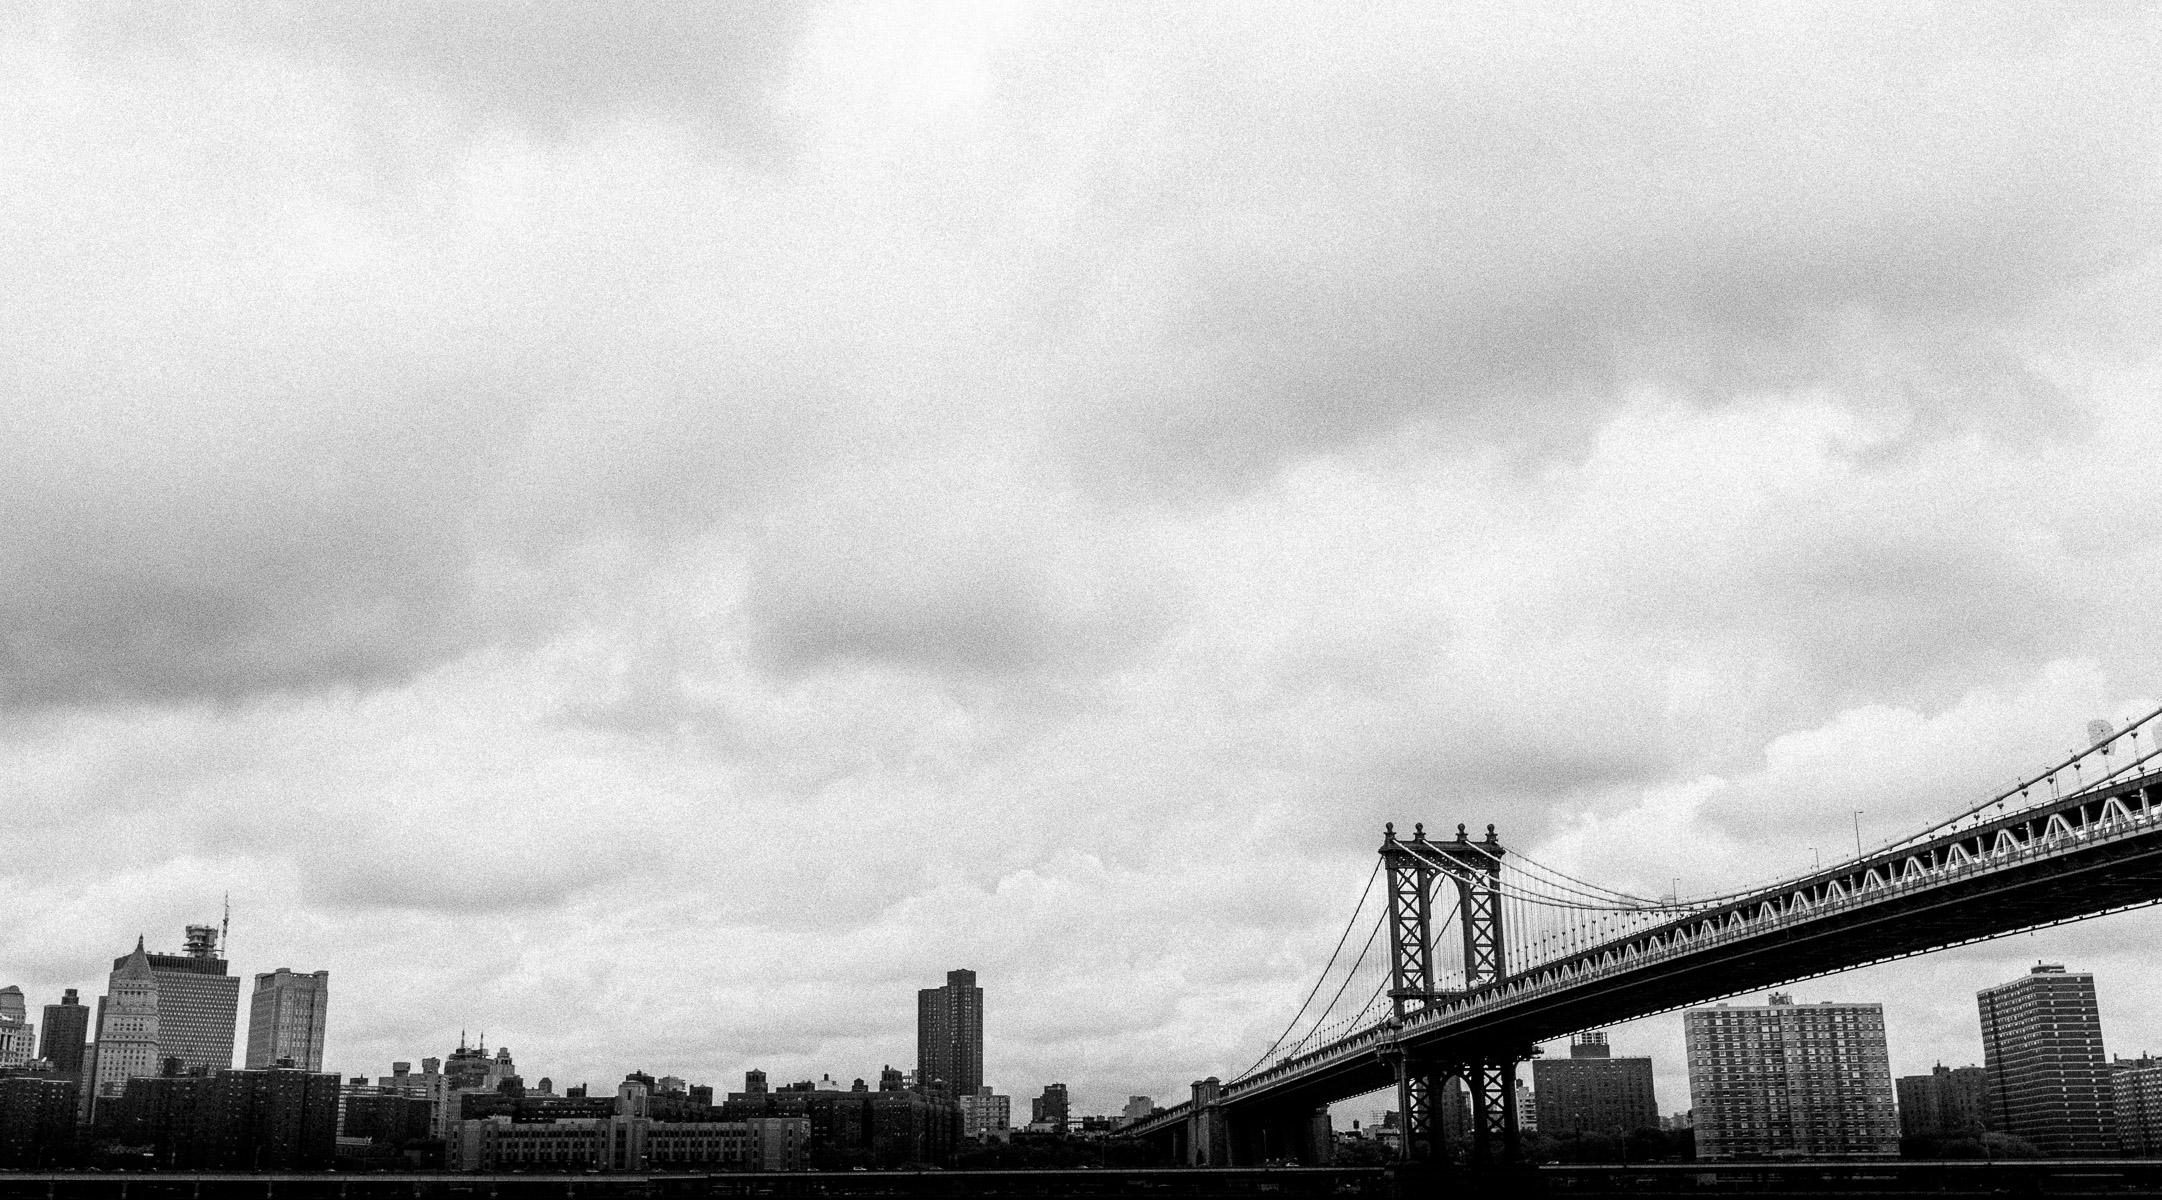 photos-of-brooklyn-bridge-in-black-and-white.jpg